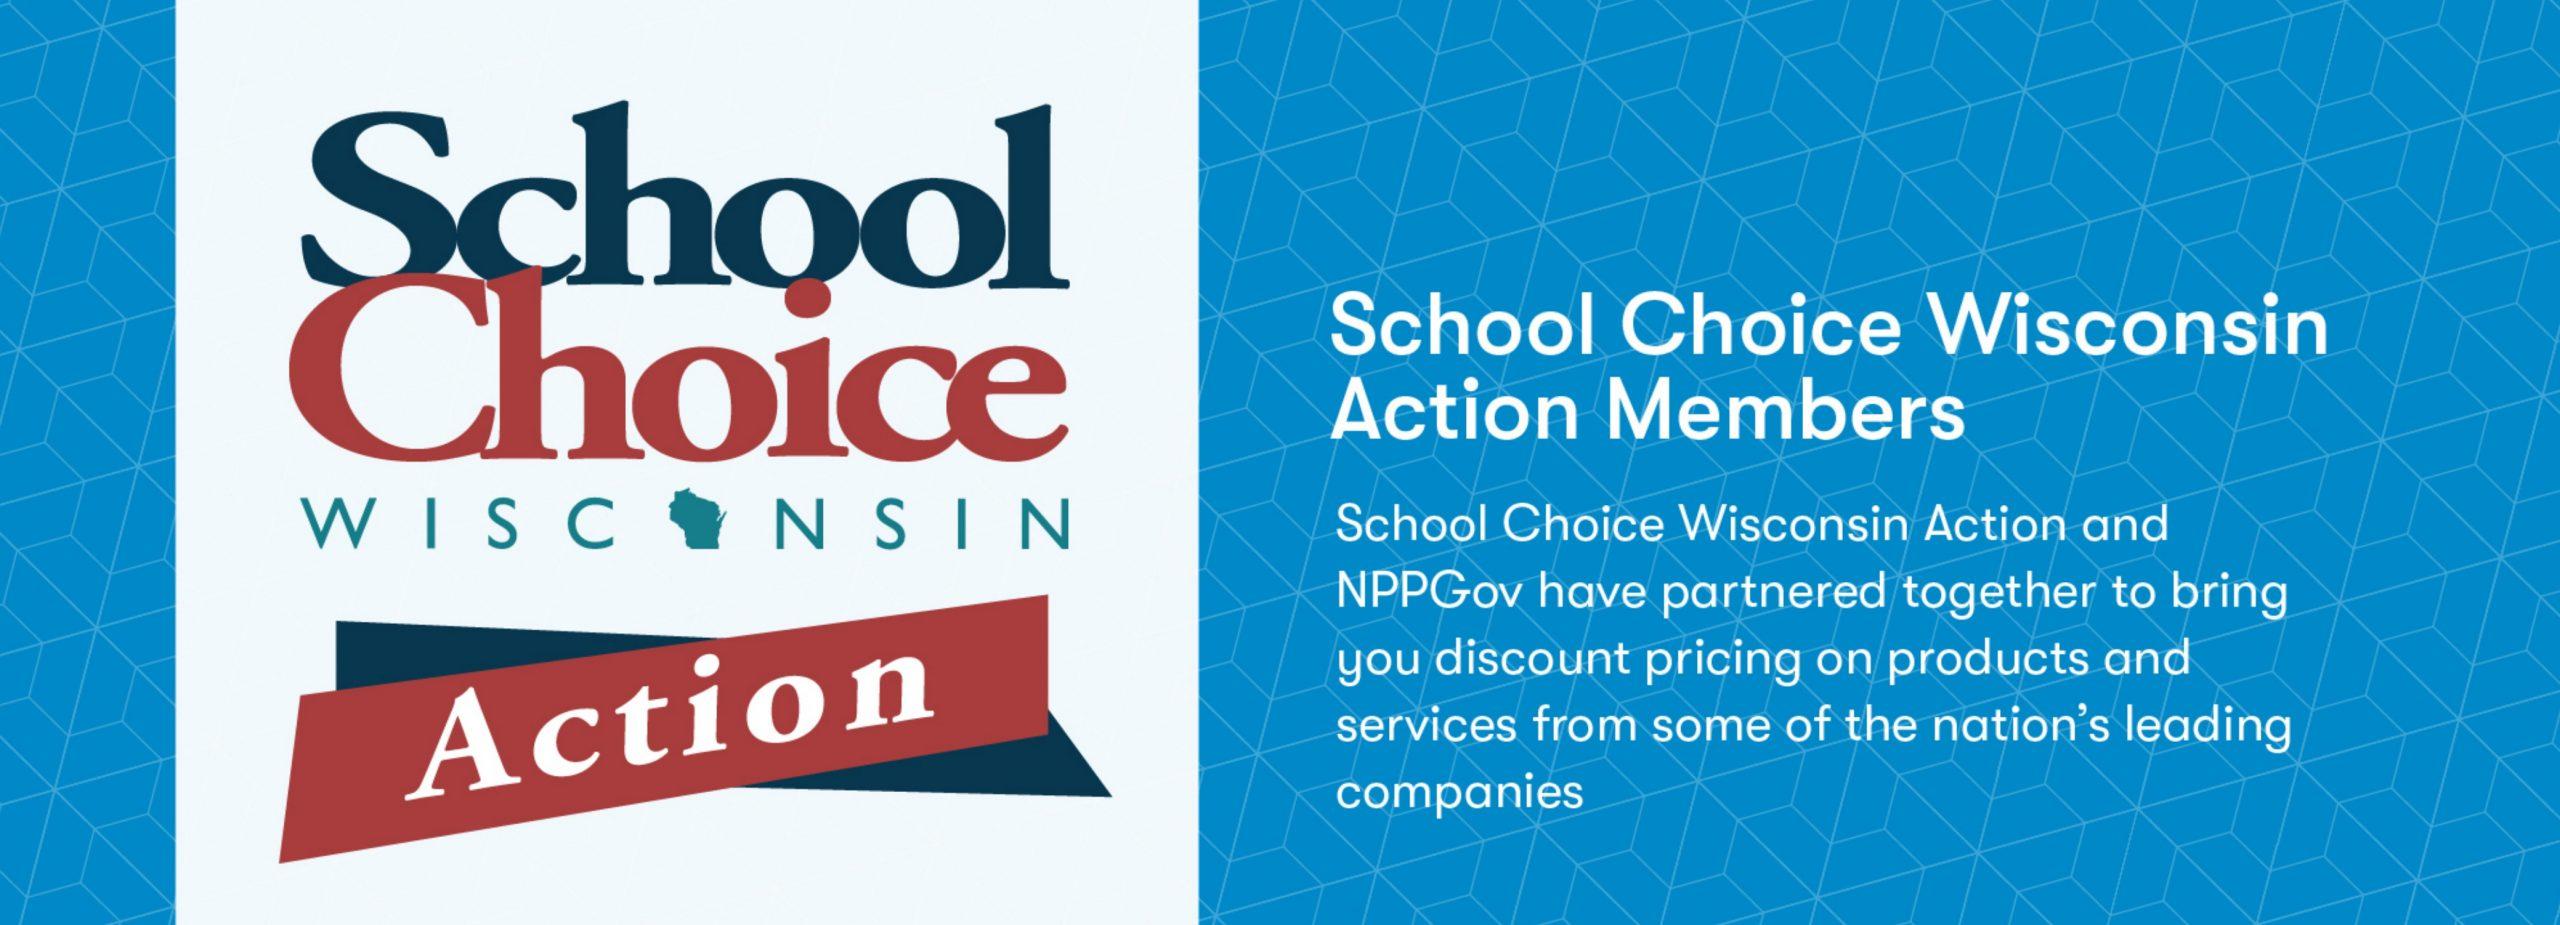 School Choice Action Partner Discounts